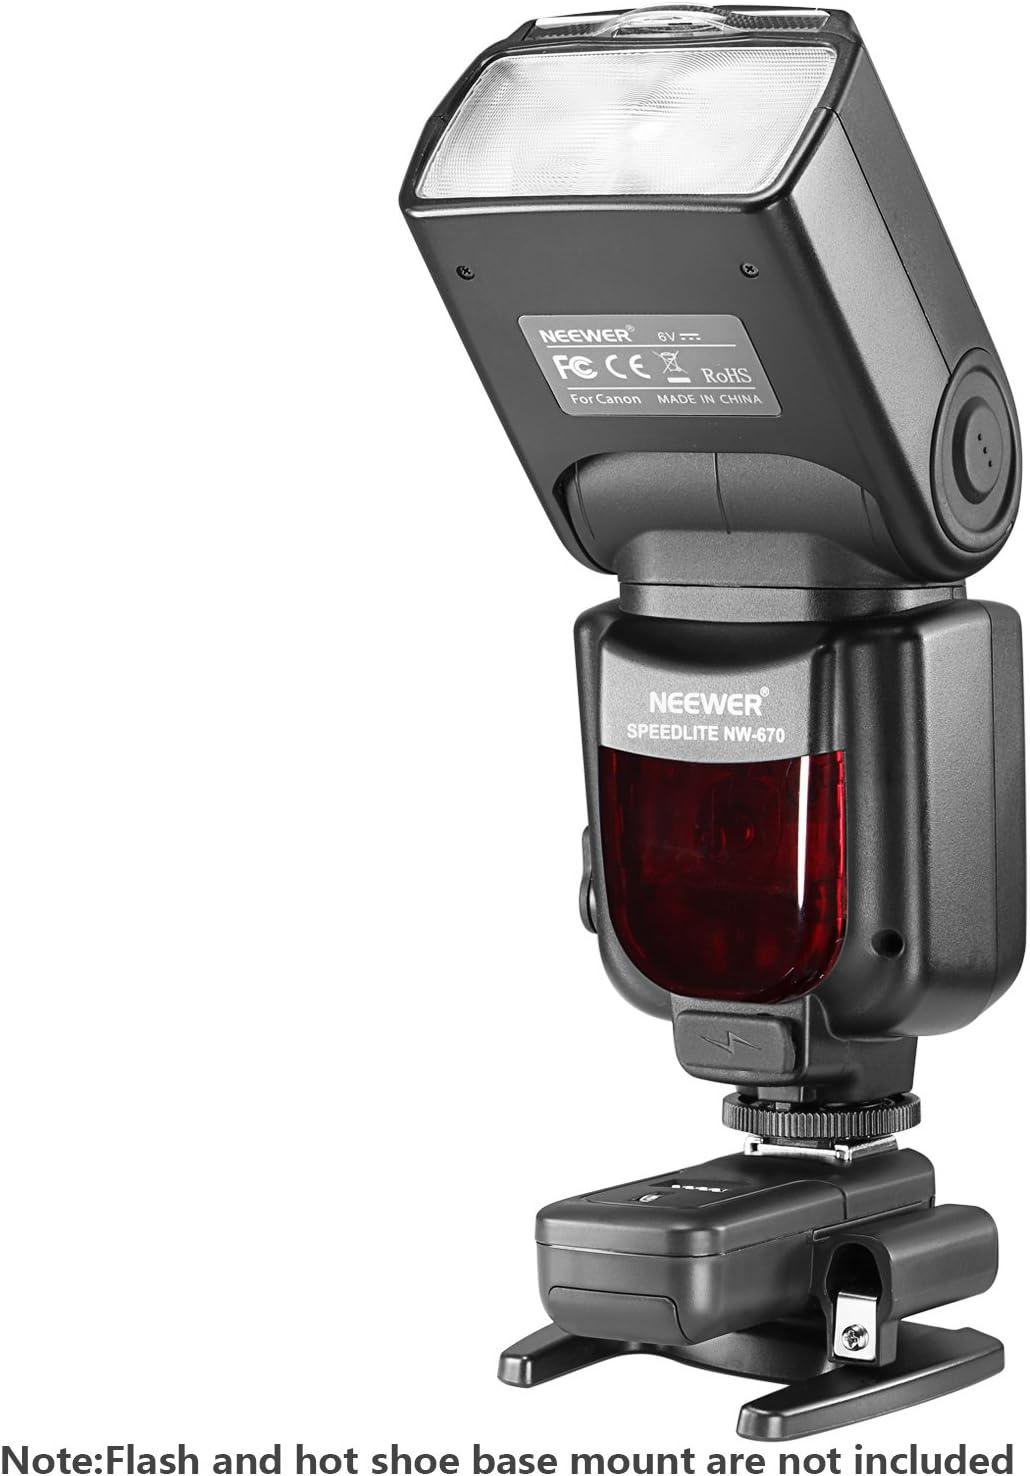 ct-16 1 geeignet f/ür Canon Nikon Pentax Olympus Panasonic DSLR-Kameras Neewer 16/Kan/äle Wireless Radio Flash Speedlite Studio Blitzausl/öser Set Sender und 4 -Receiver inkl.